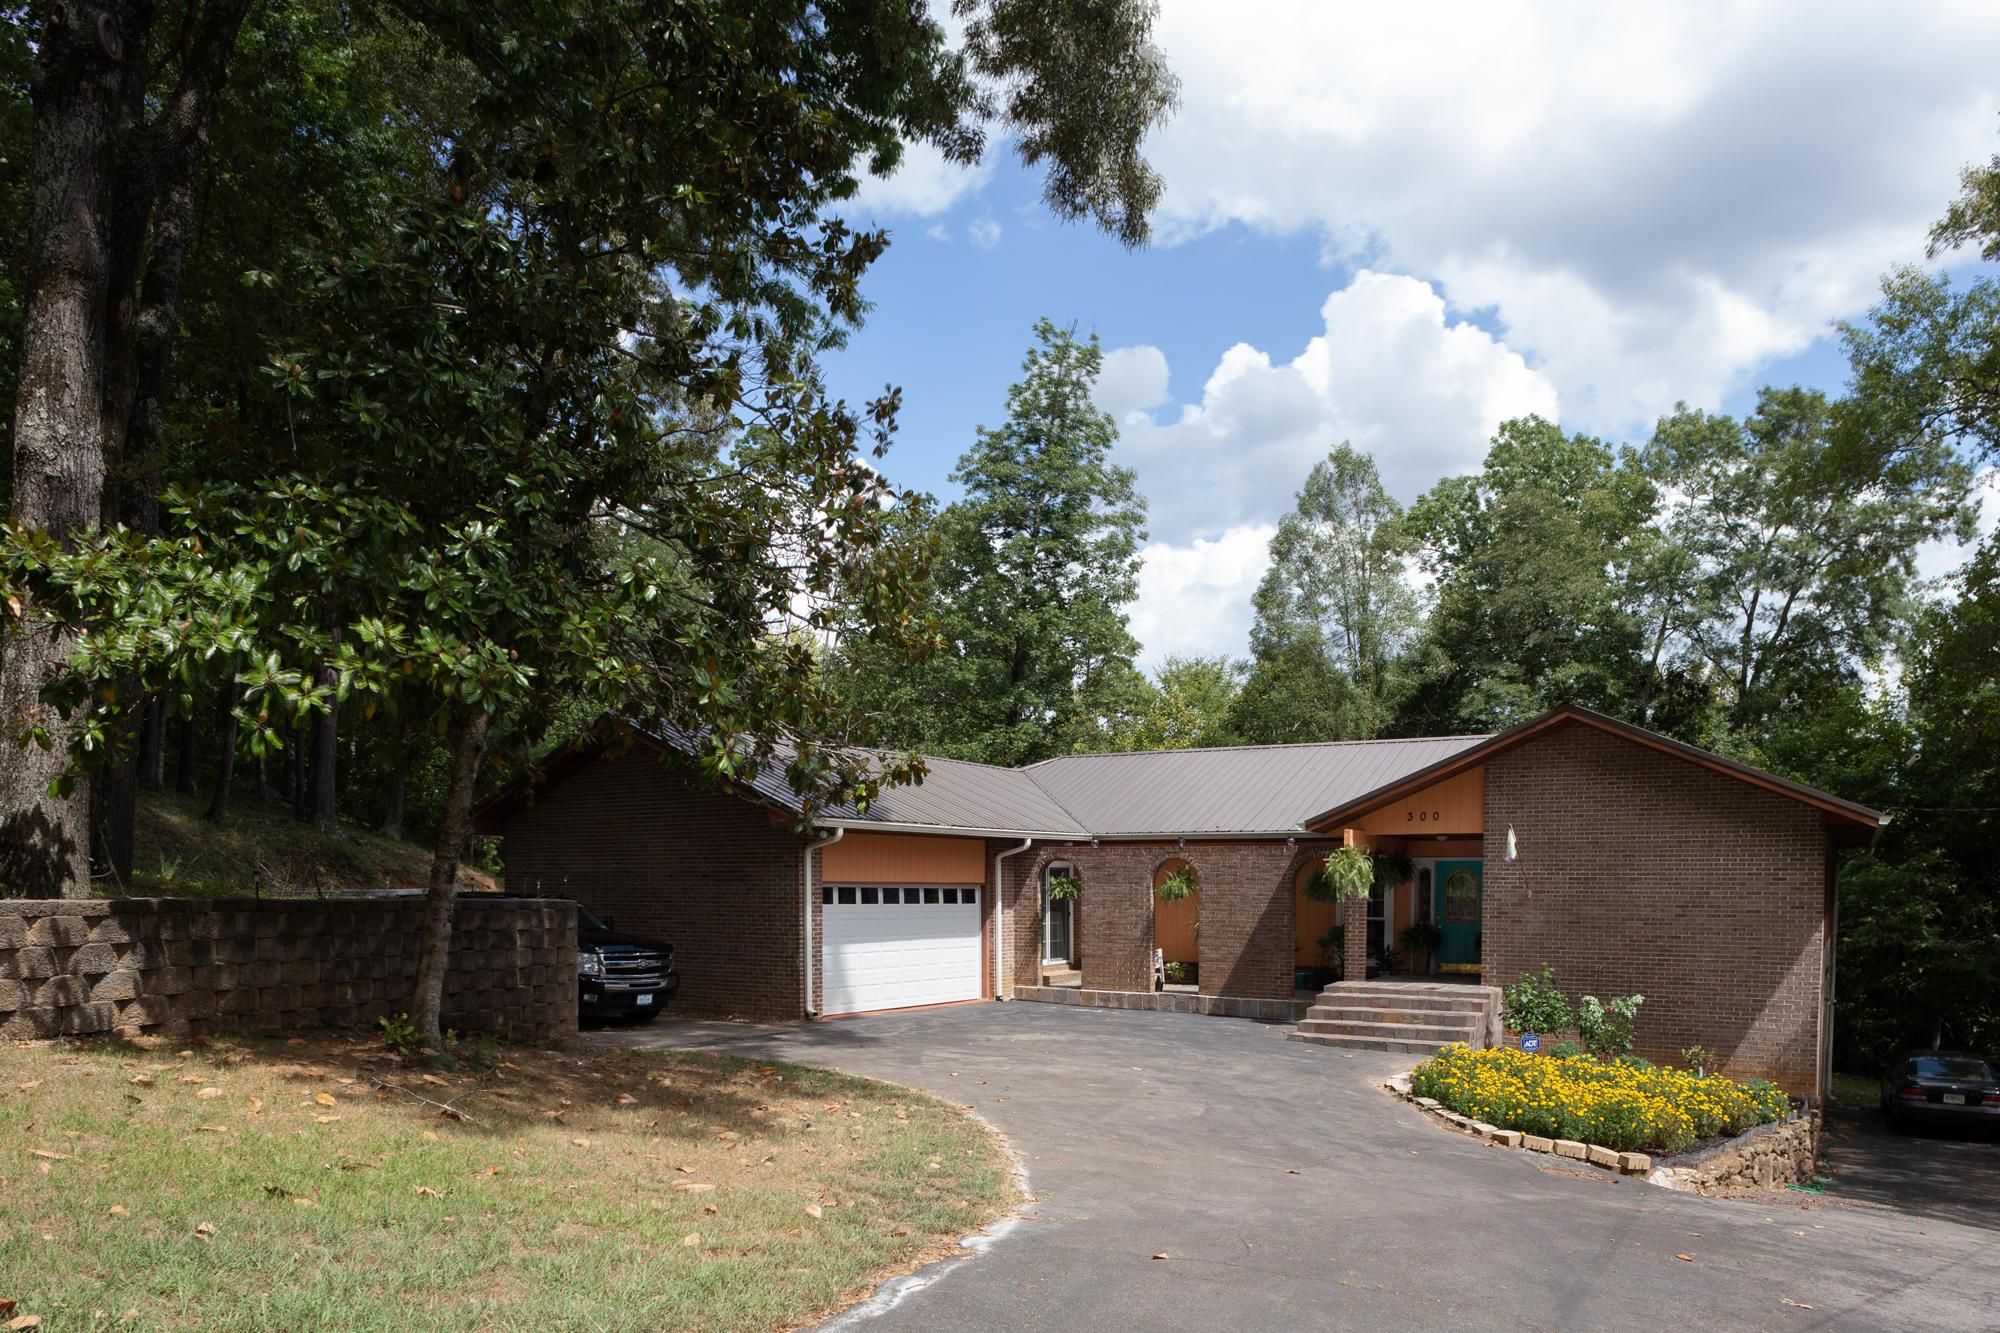 300 Raulstontown Rd, South Pittsburg, TN 37380